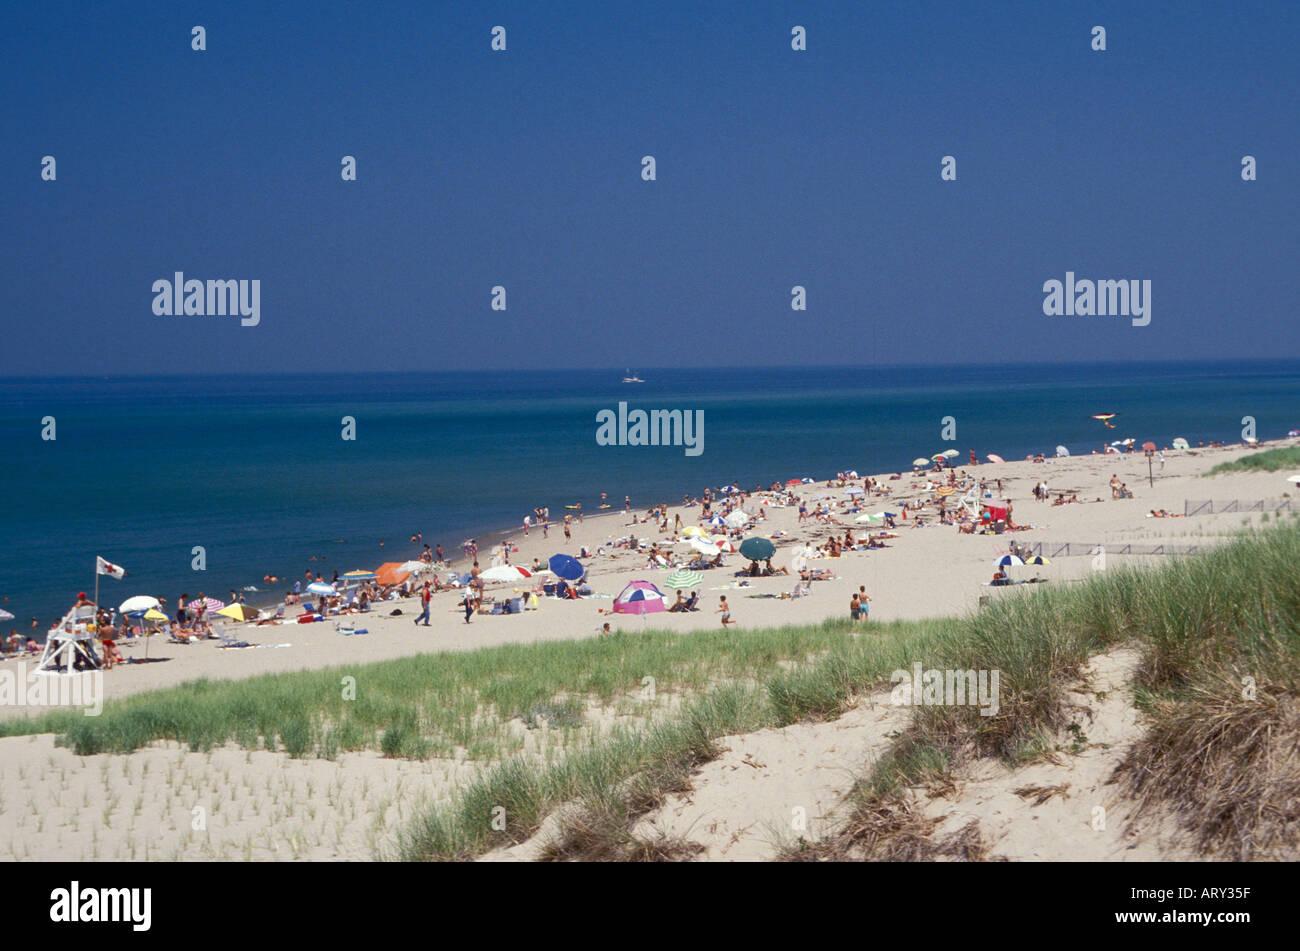 Public swimming and sun bathing at Cape Cod National Seashore Massachusetts - Stock Image